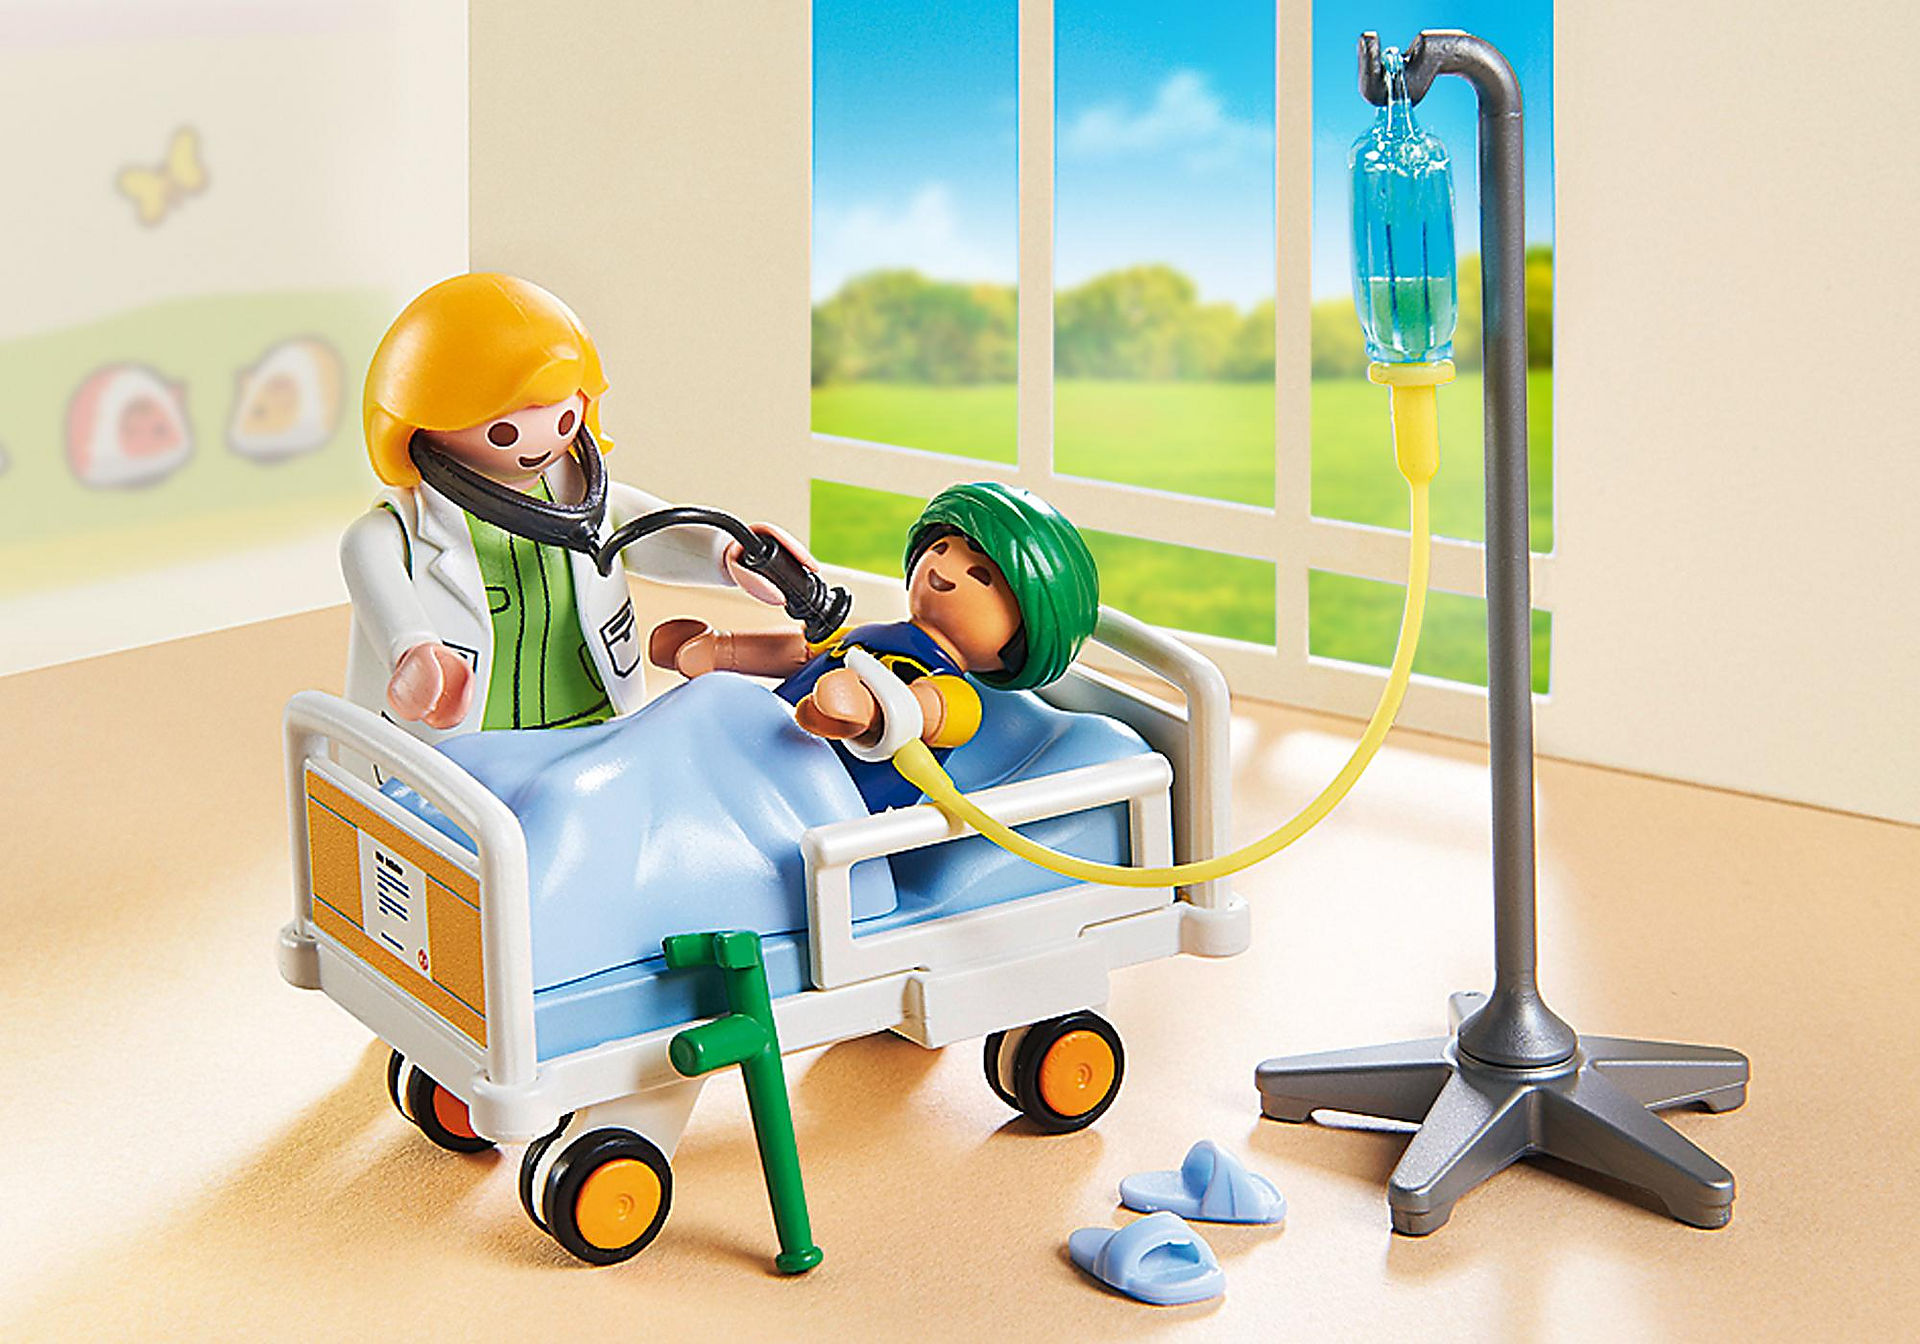 http://media.playmobil.com/i/playmobil/6661_product_extra1/Doctora con niño